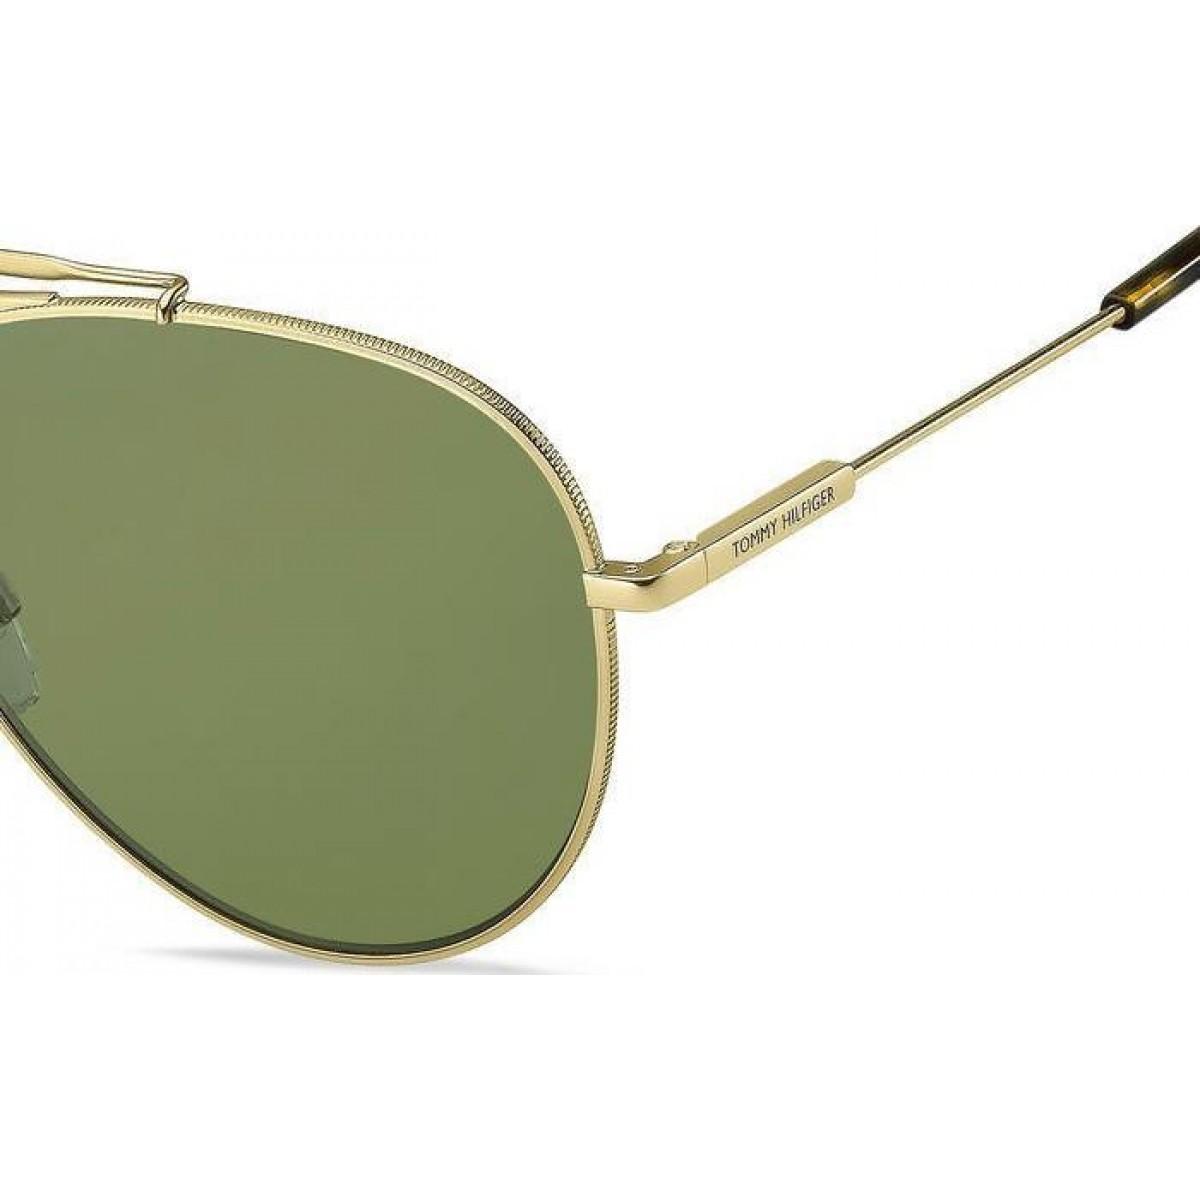 Tommy Hilfiger Γυαλιά Ηλίου TH1709/AOZ Ανδρικά gold-green